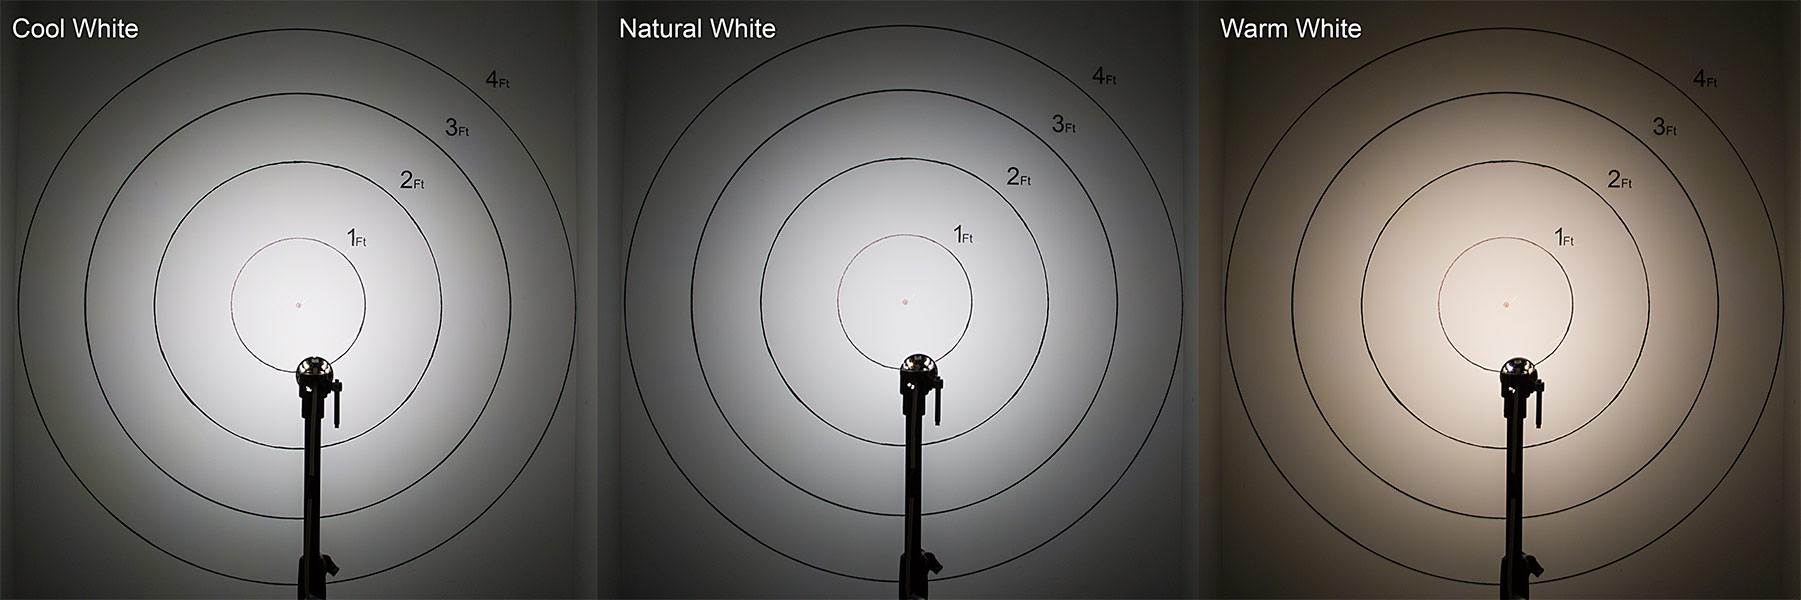 Cool white vs warm white led lights - Led Recessed Light Engine Square 90mm Gimbal Trim 8 Watt Cob Led